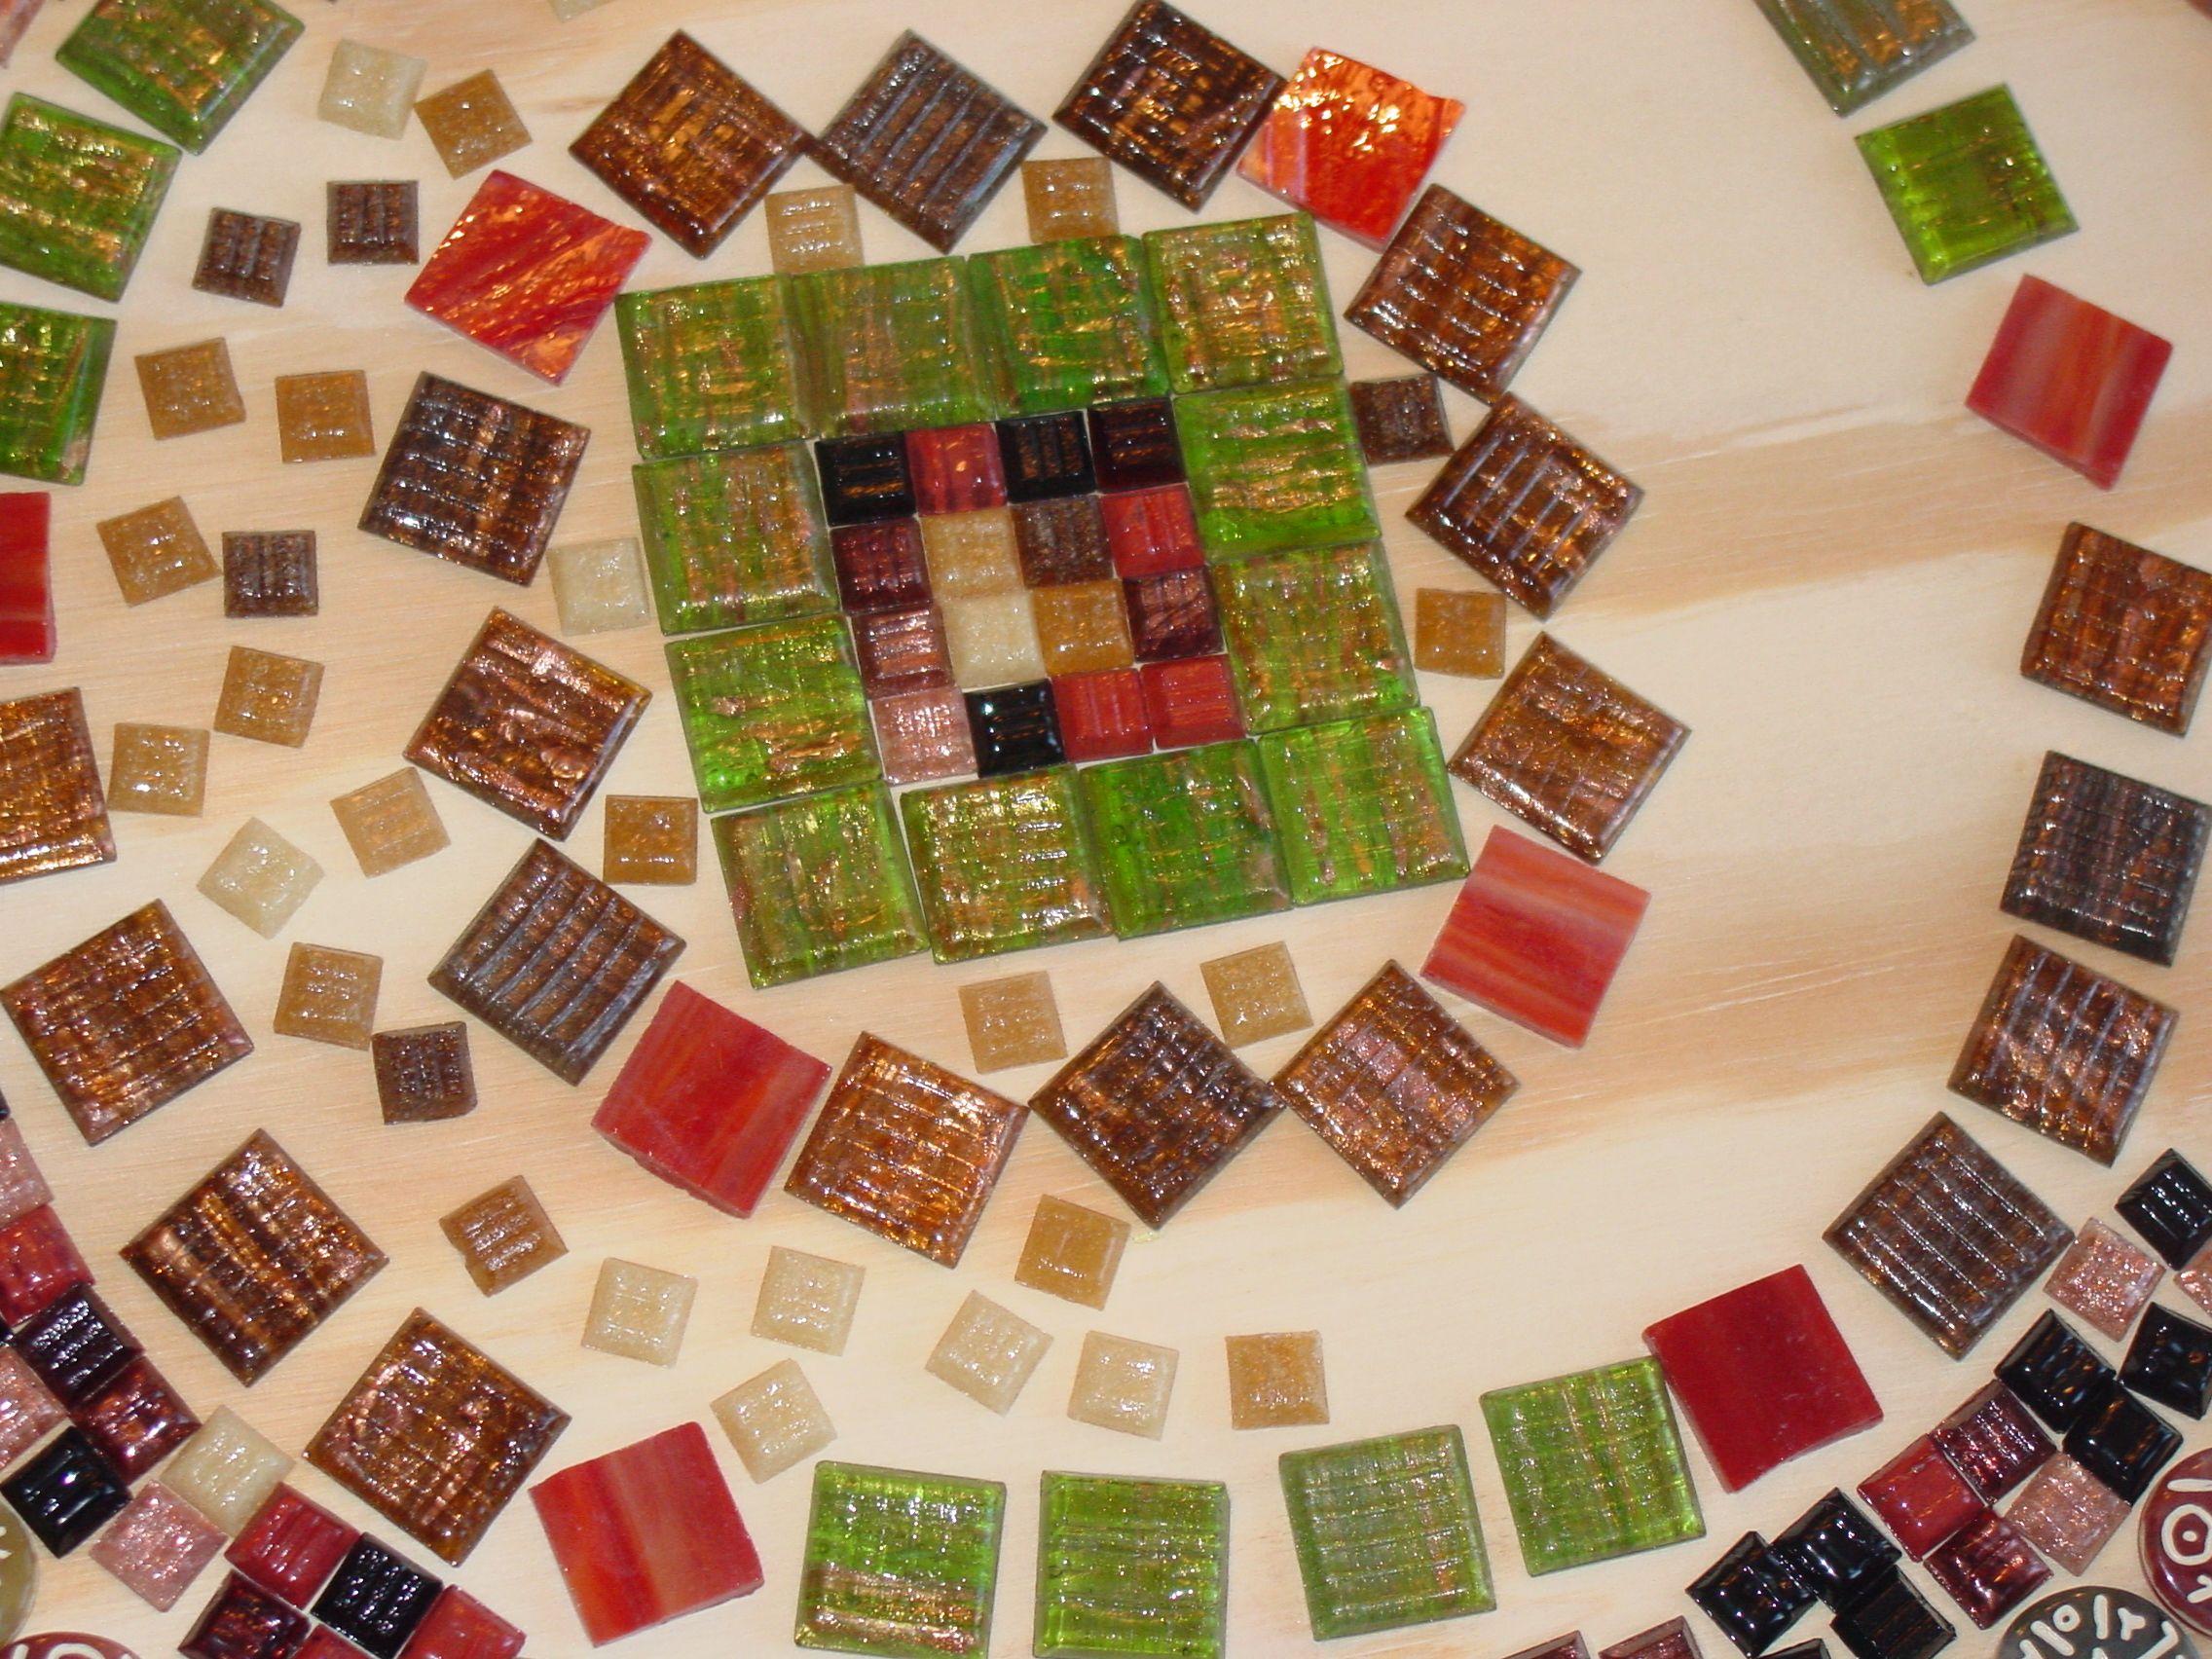 How to make ceramic tile mosaics mosaics mosaic designs and glass how to make ceramic tile mosaics dailygadgetfo Gallery